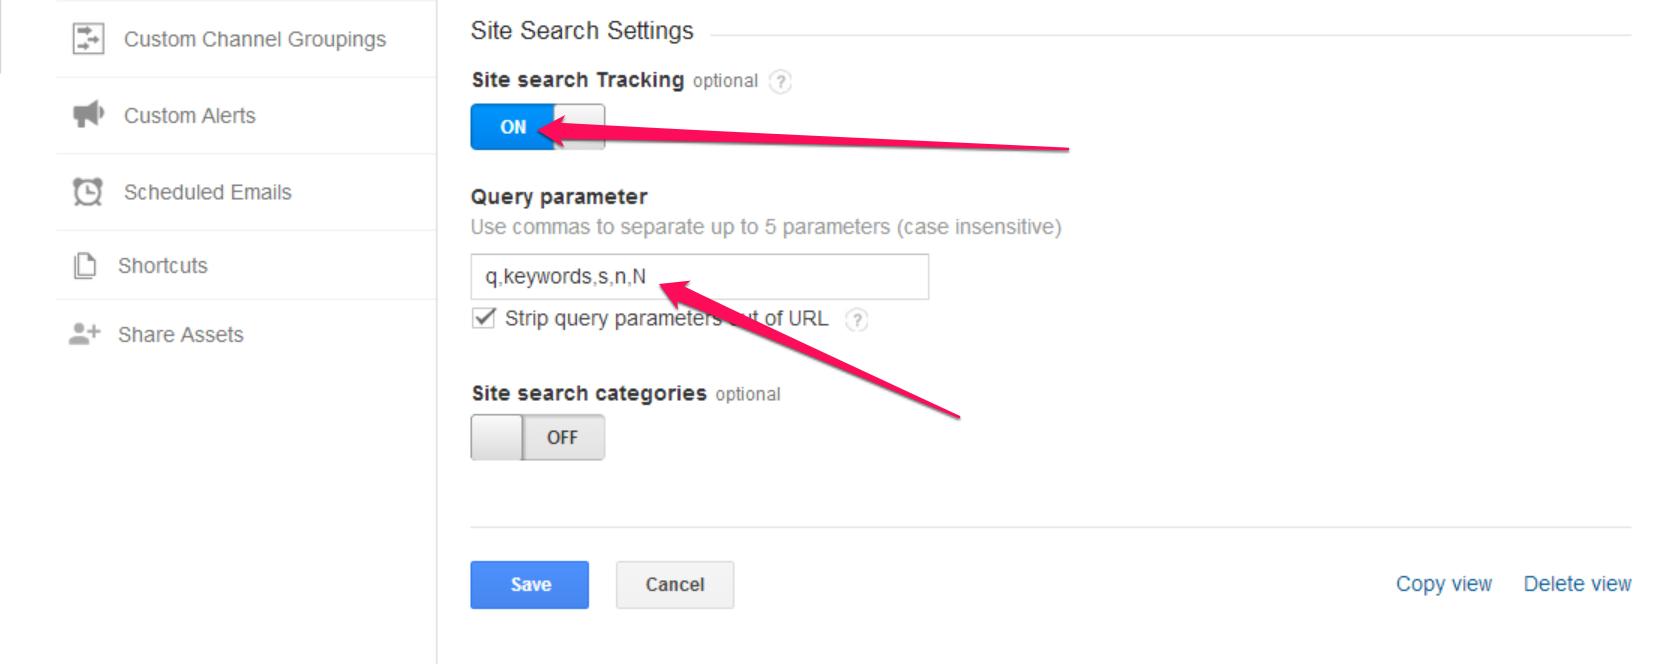 Activate site search